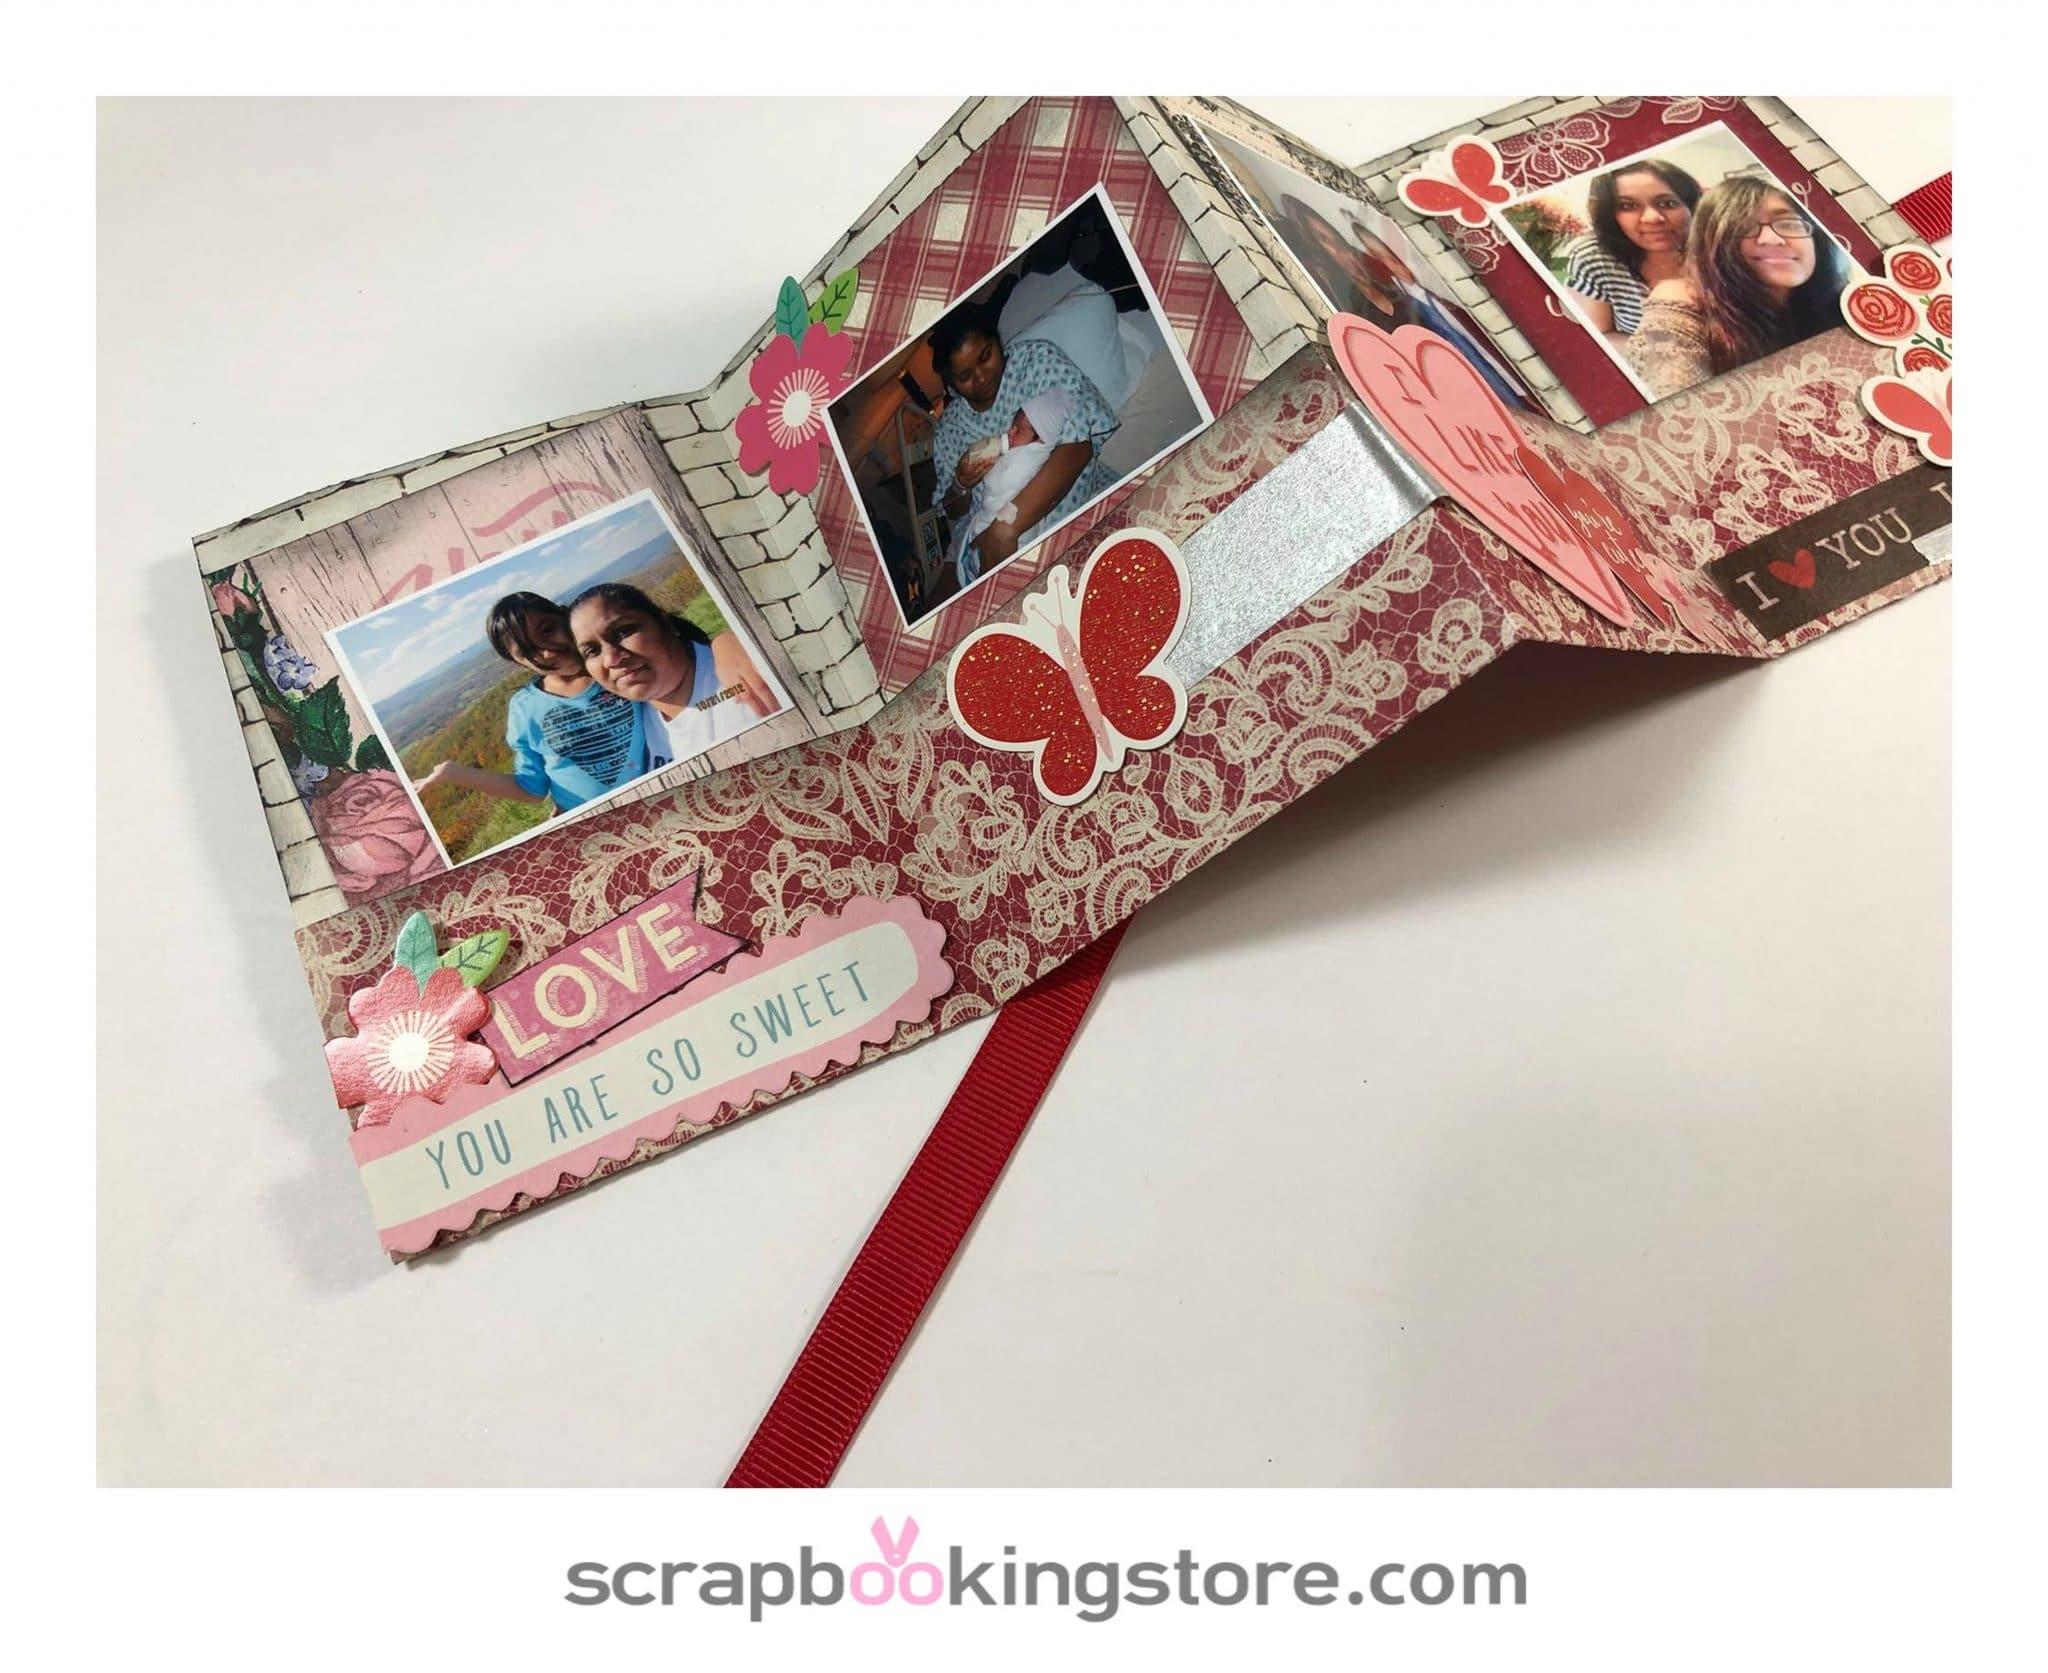 ScrapbookingStore - Becky favorite layout